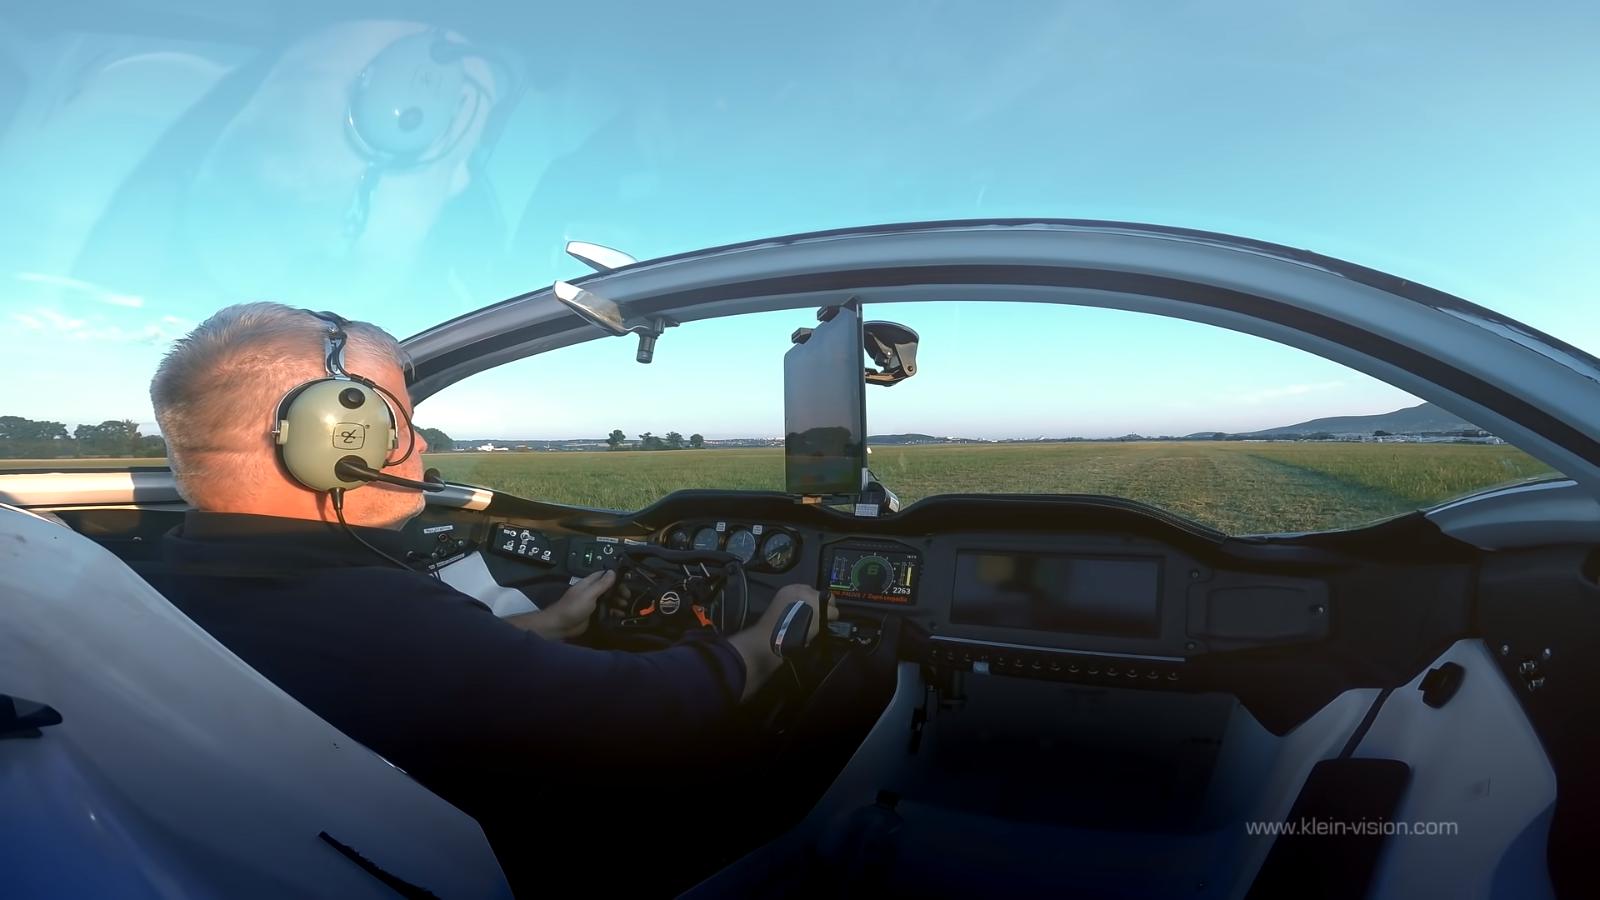 cabine carro voador aircar prototype1